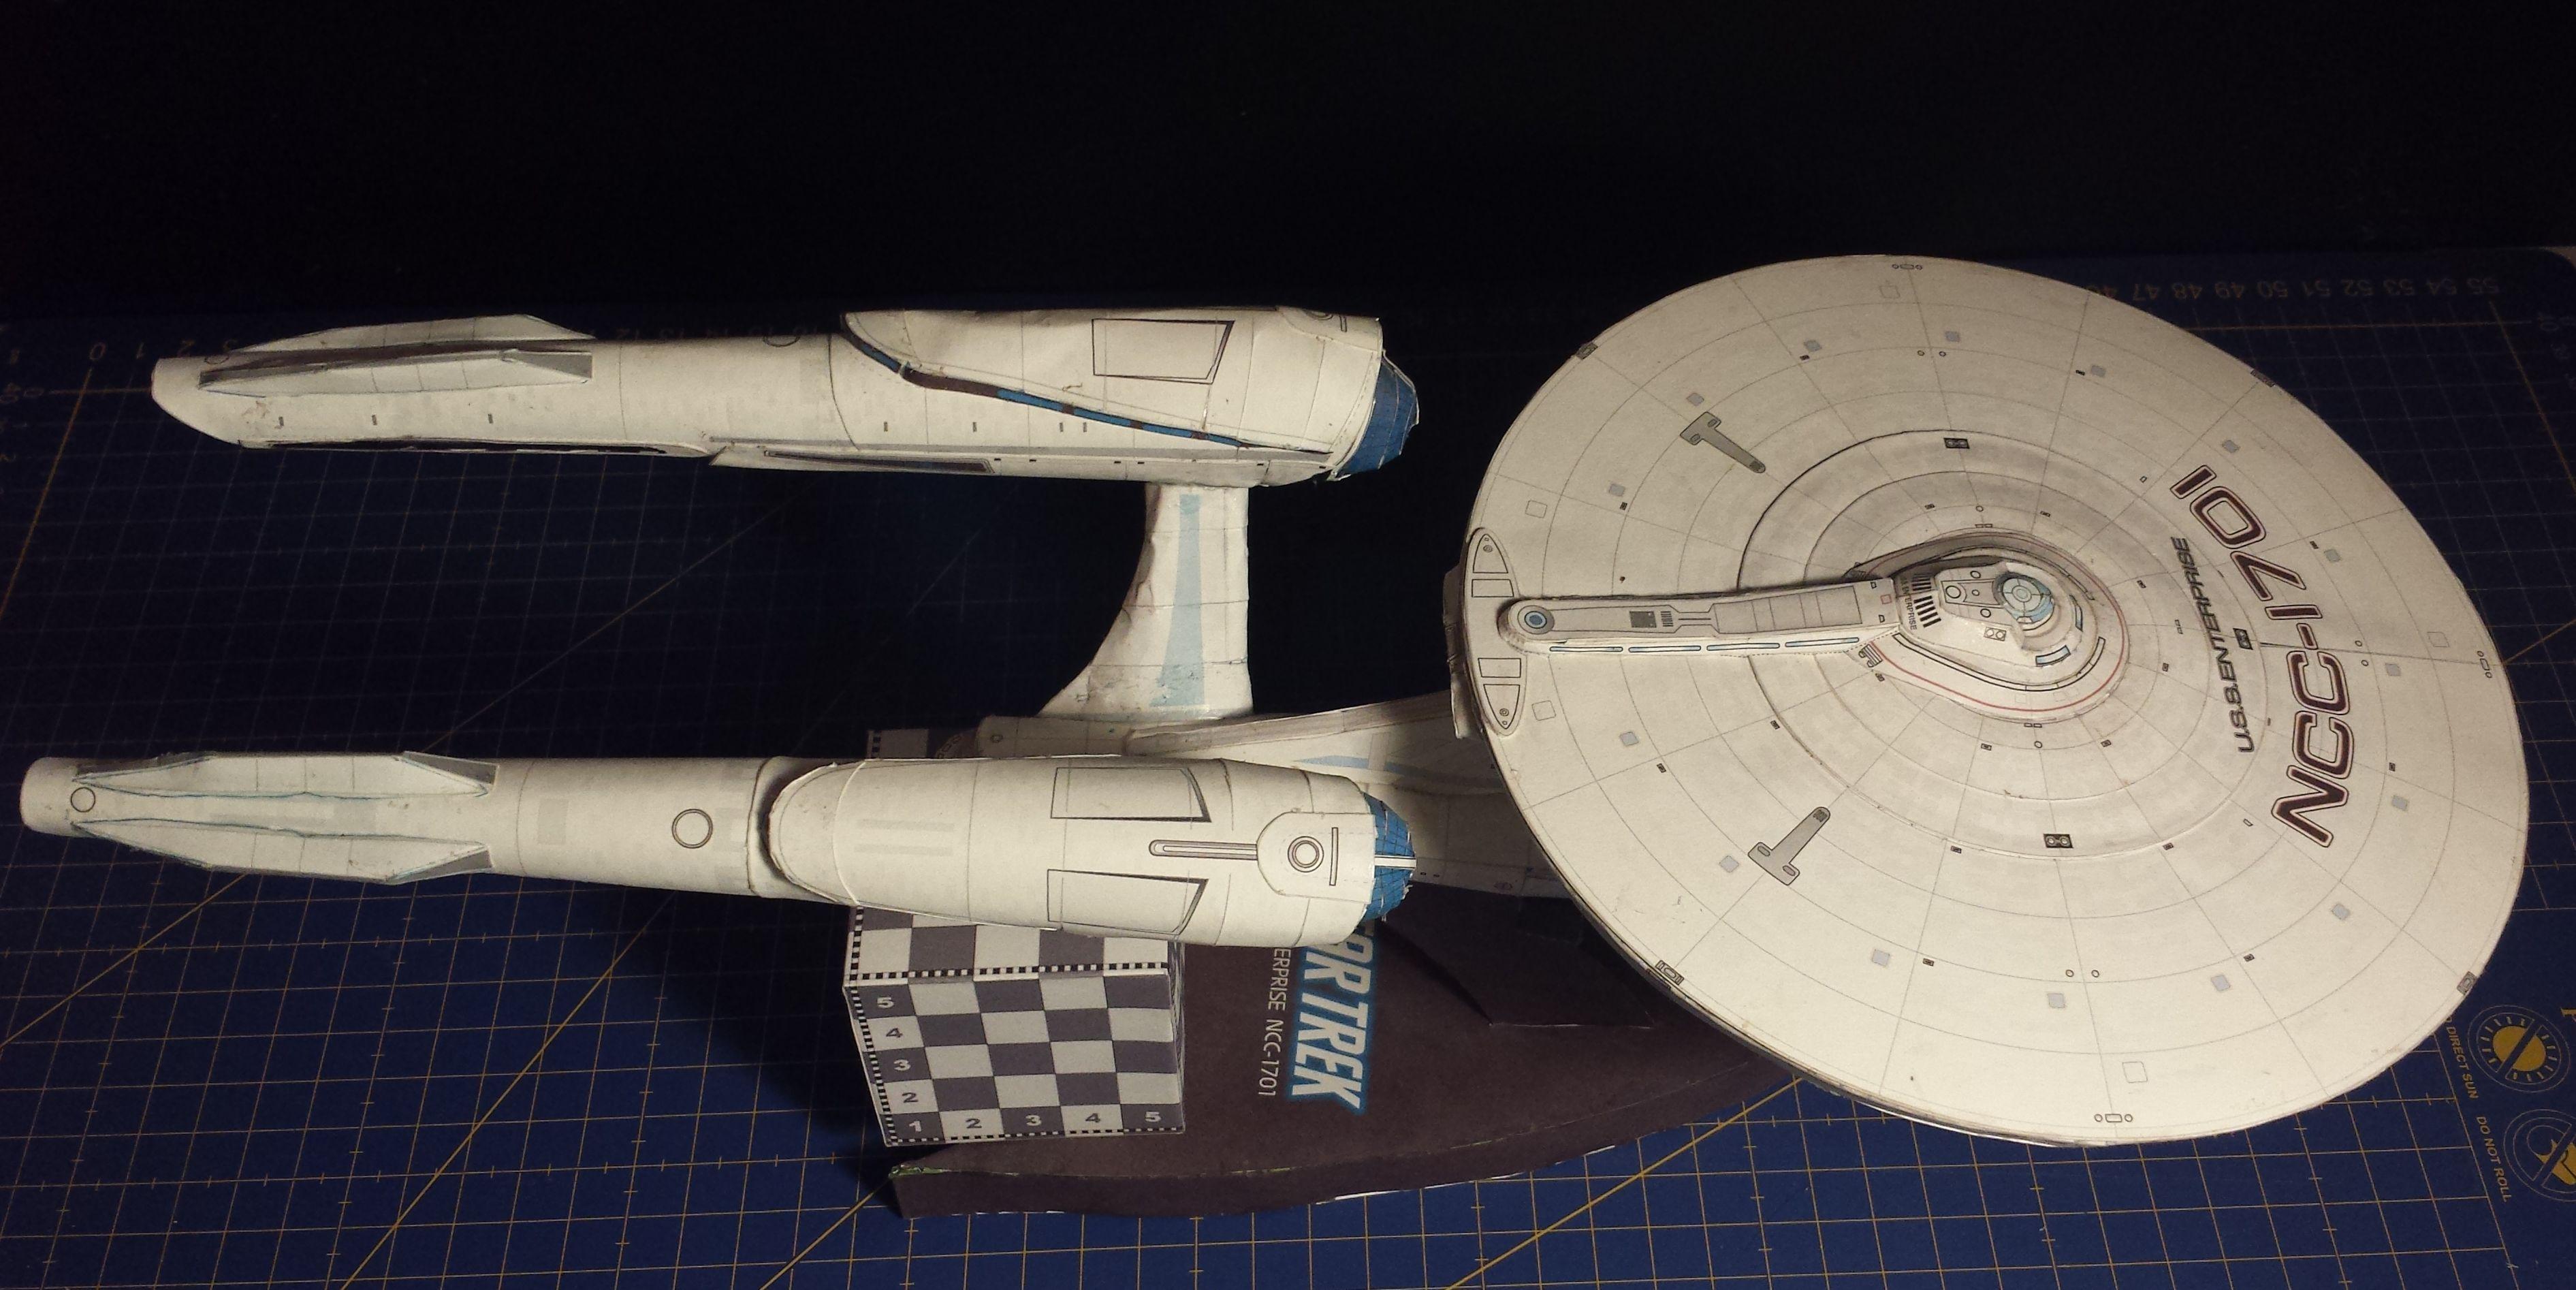 Welcome to Star Trek Minutiae!